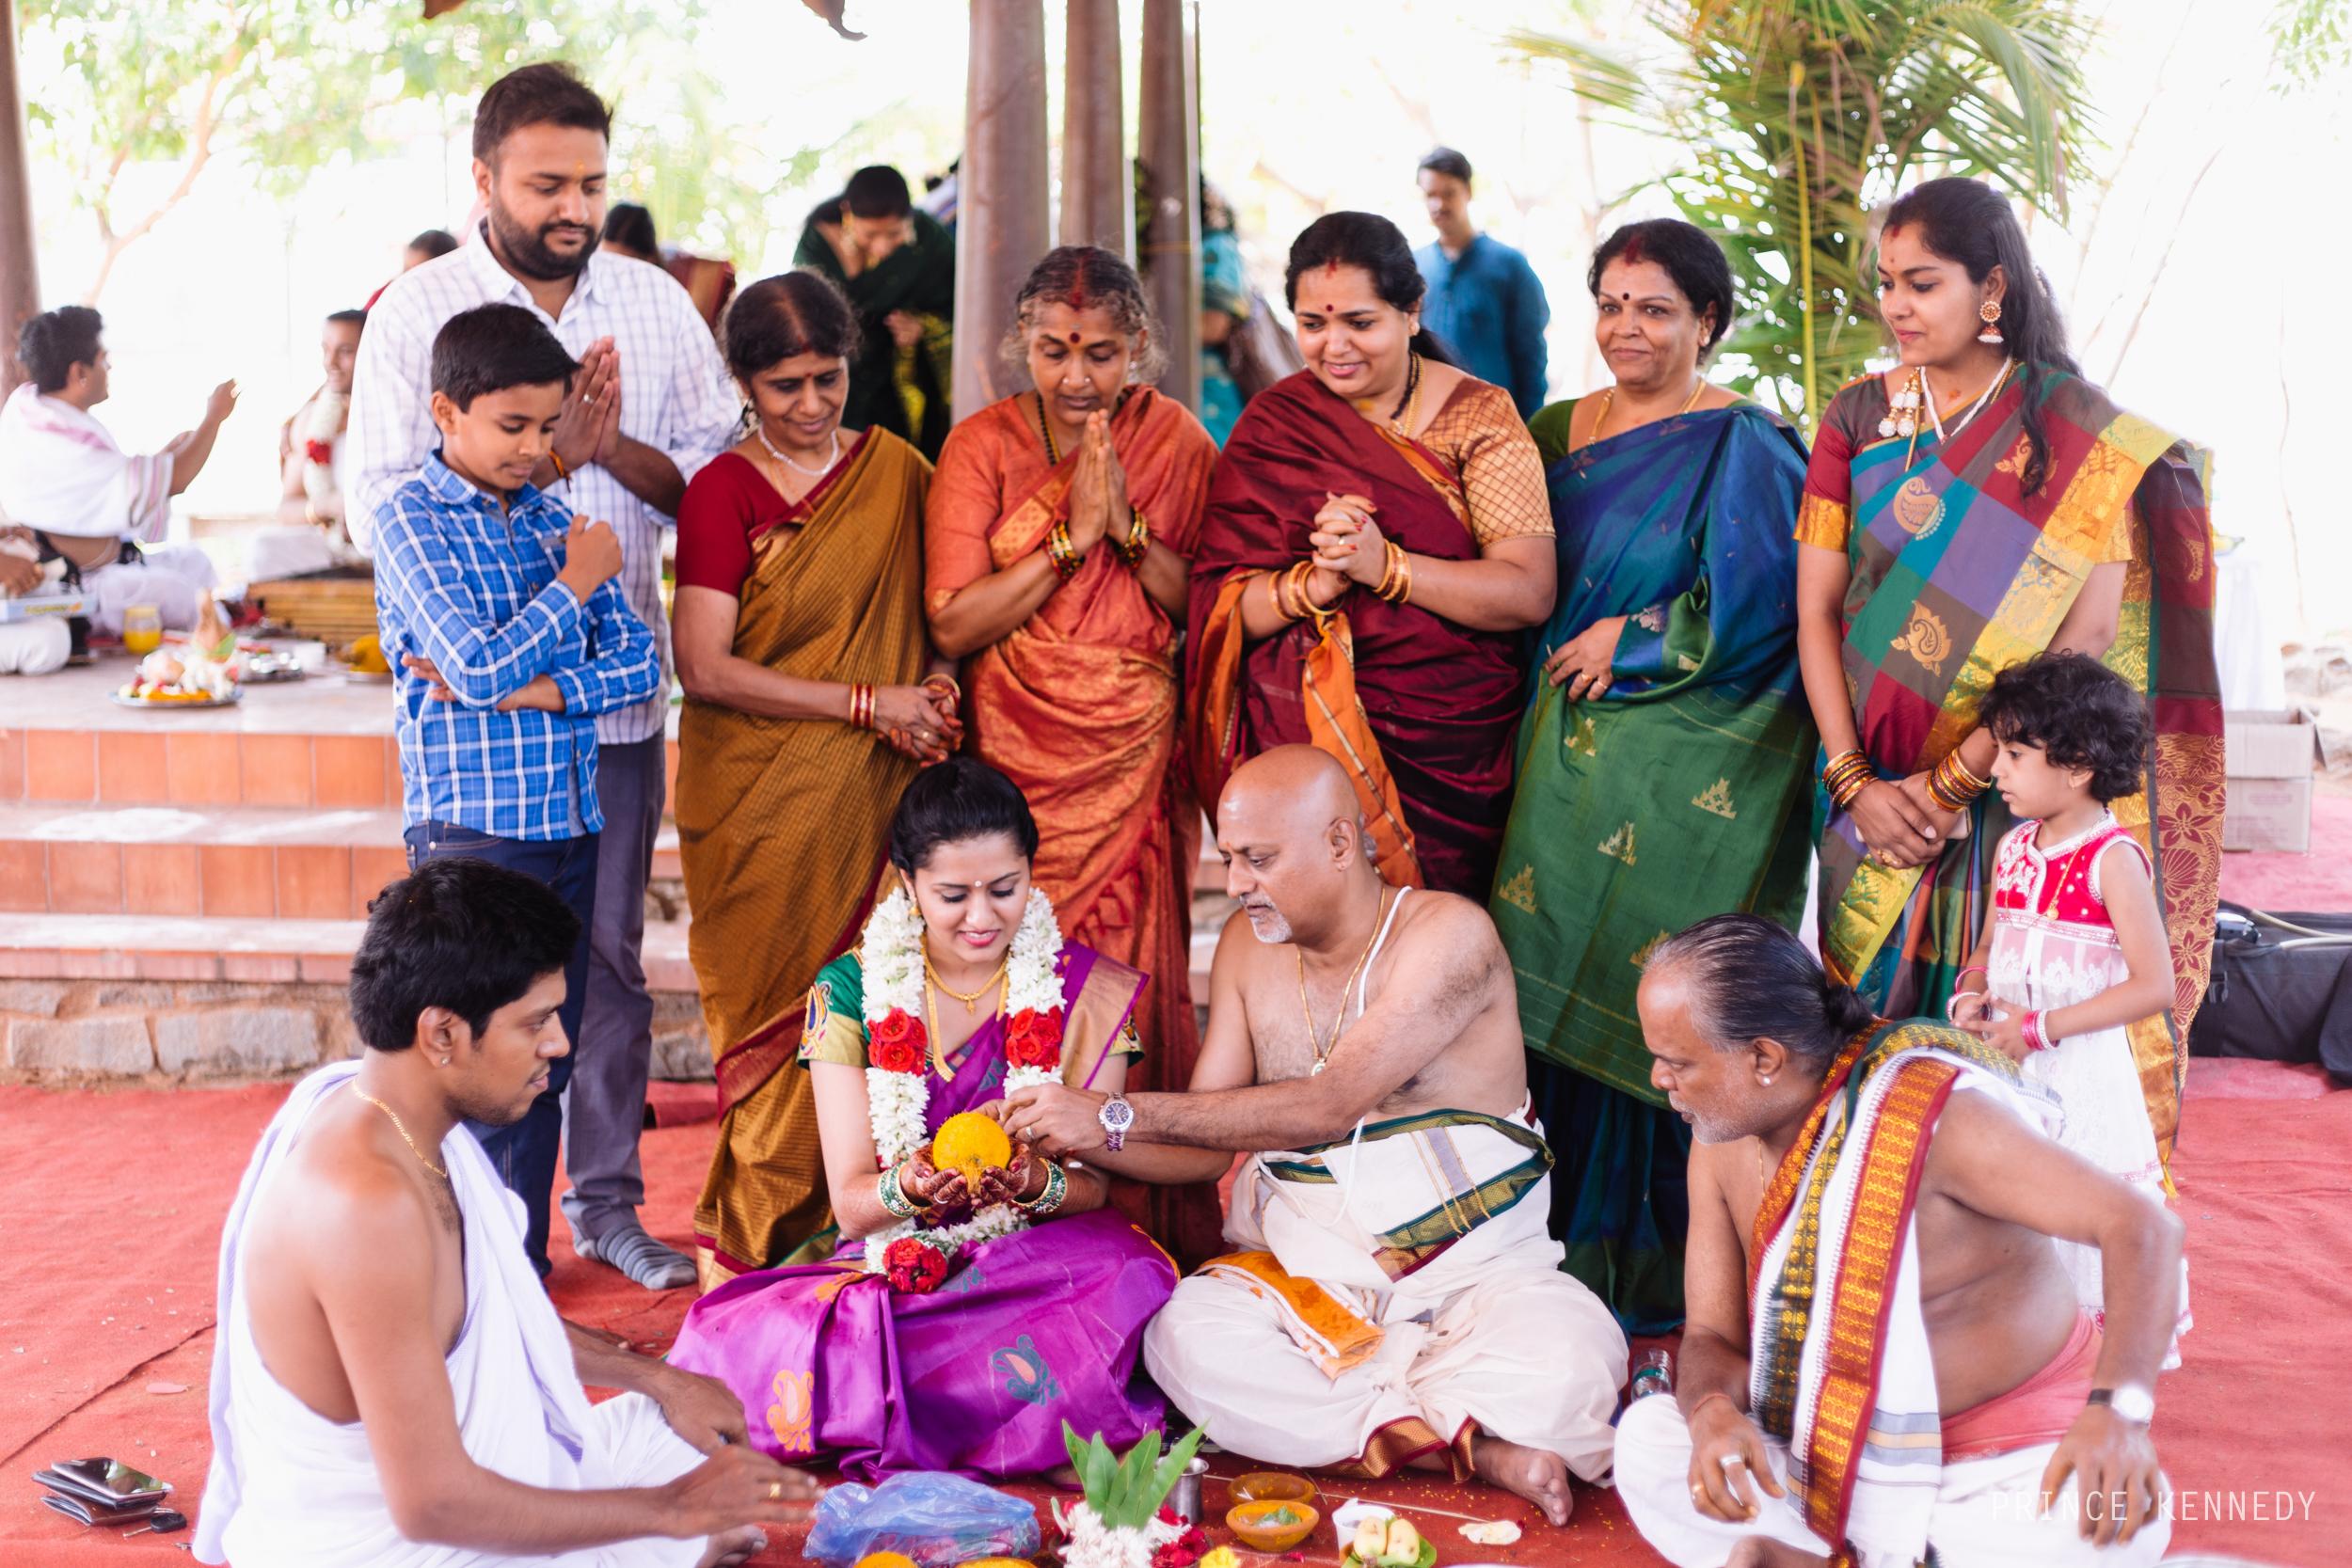 Athmajja-Nithesh-Engagement-Couple-Portrait-Portraiture-Wedding-Couple-Portrait-Chennai-Photographer-Candid-Photography-Destination-Best-Prince-Kennedy-Photography-124.jpg